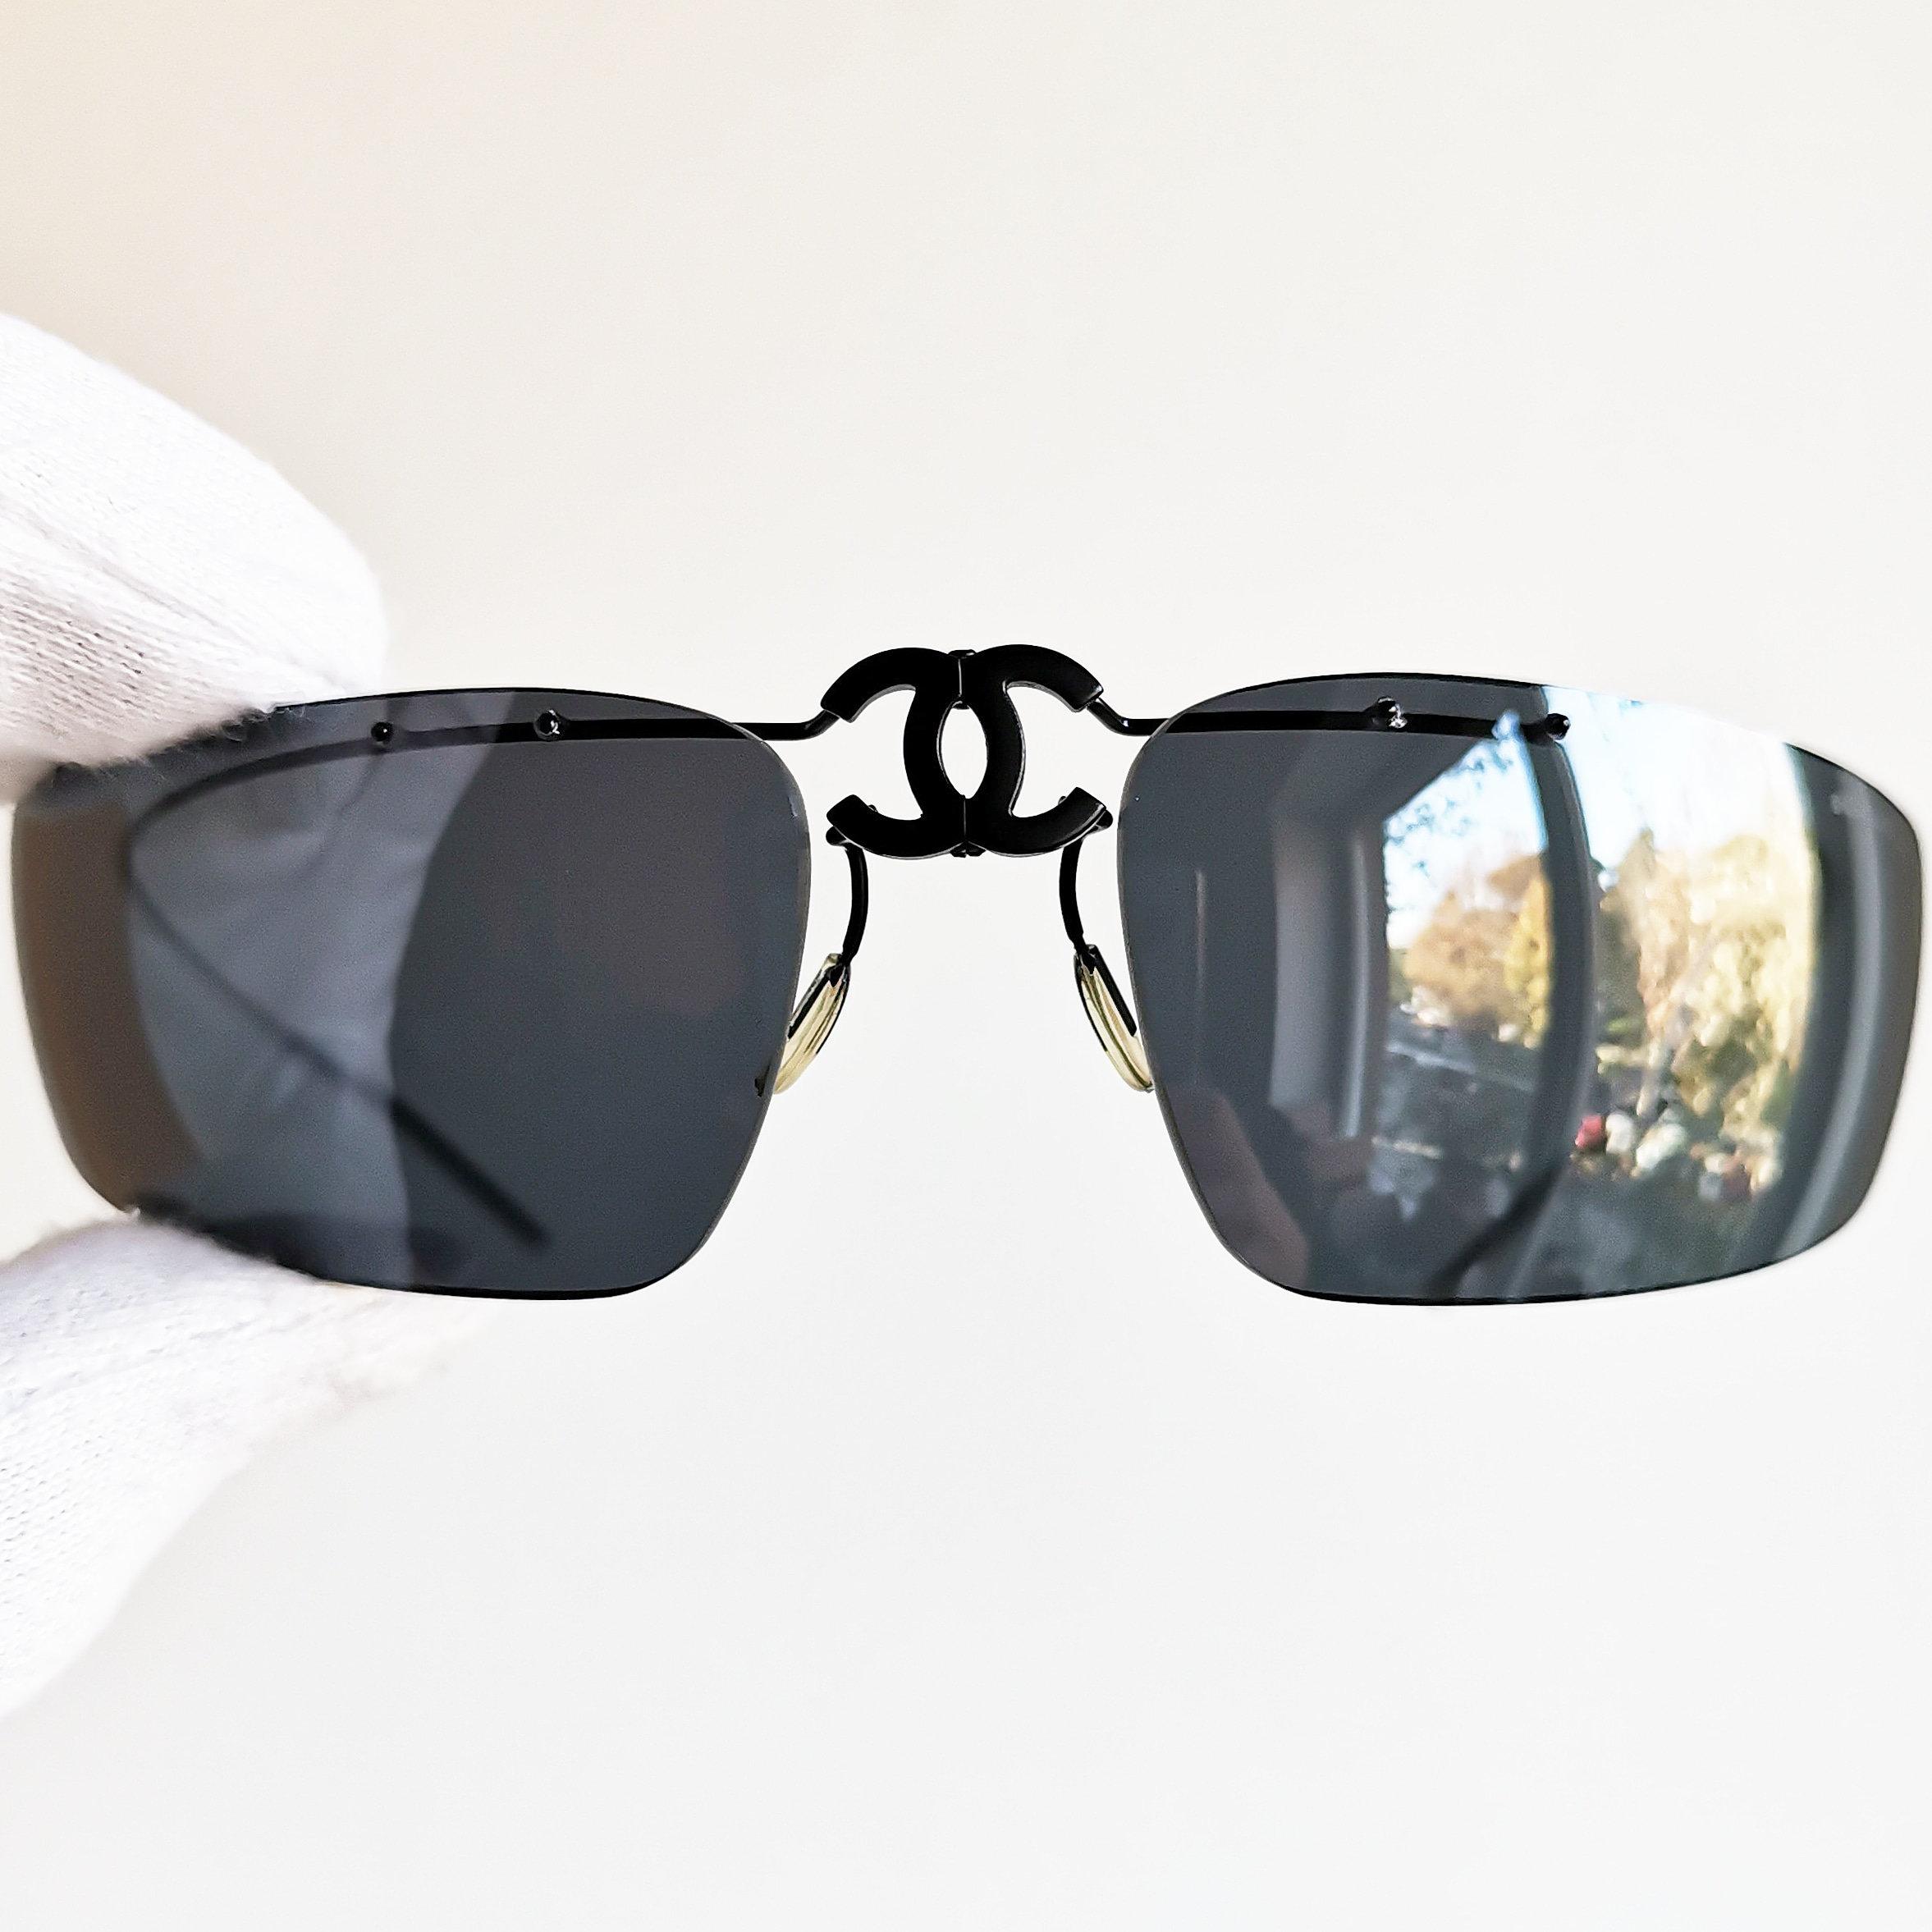 8abf4649cf7a Chanel sunglasses vintage rare oval rectangular wrap folding etsy jpg  2354x2354 Old chanel sunglasses